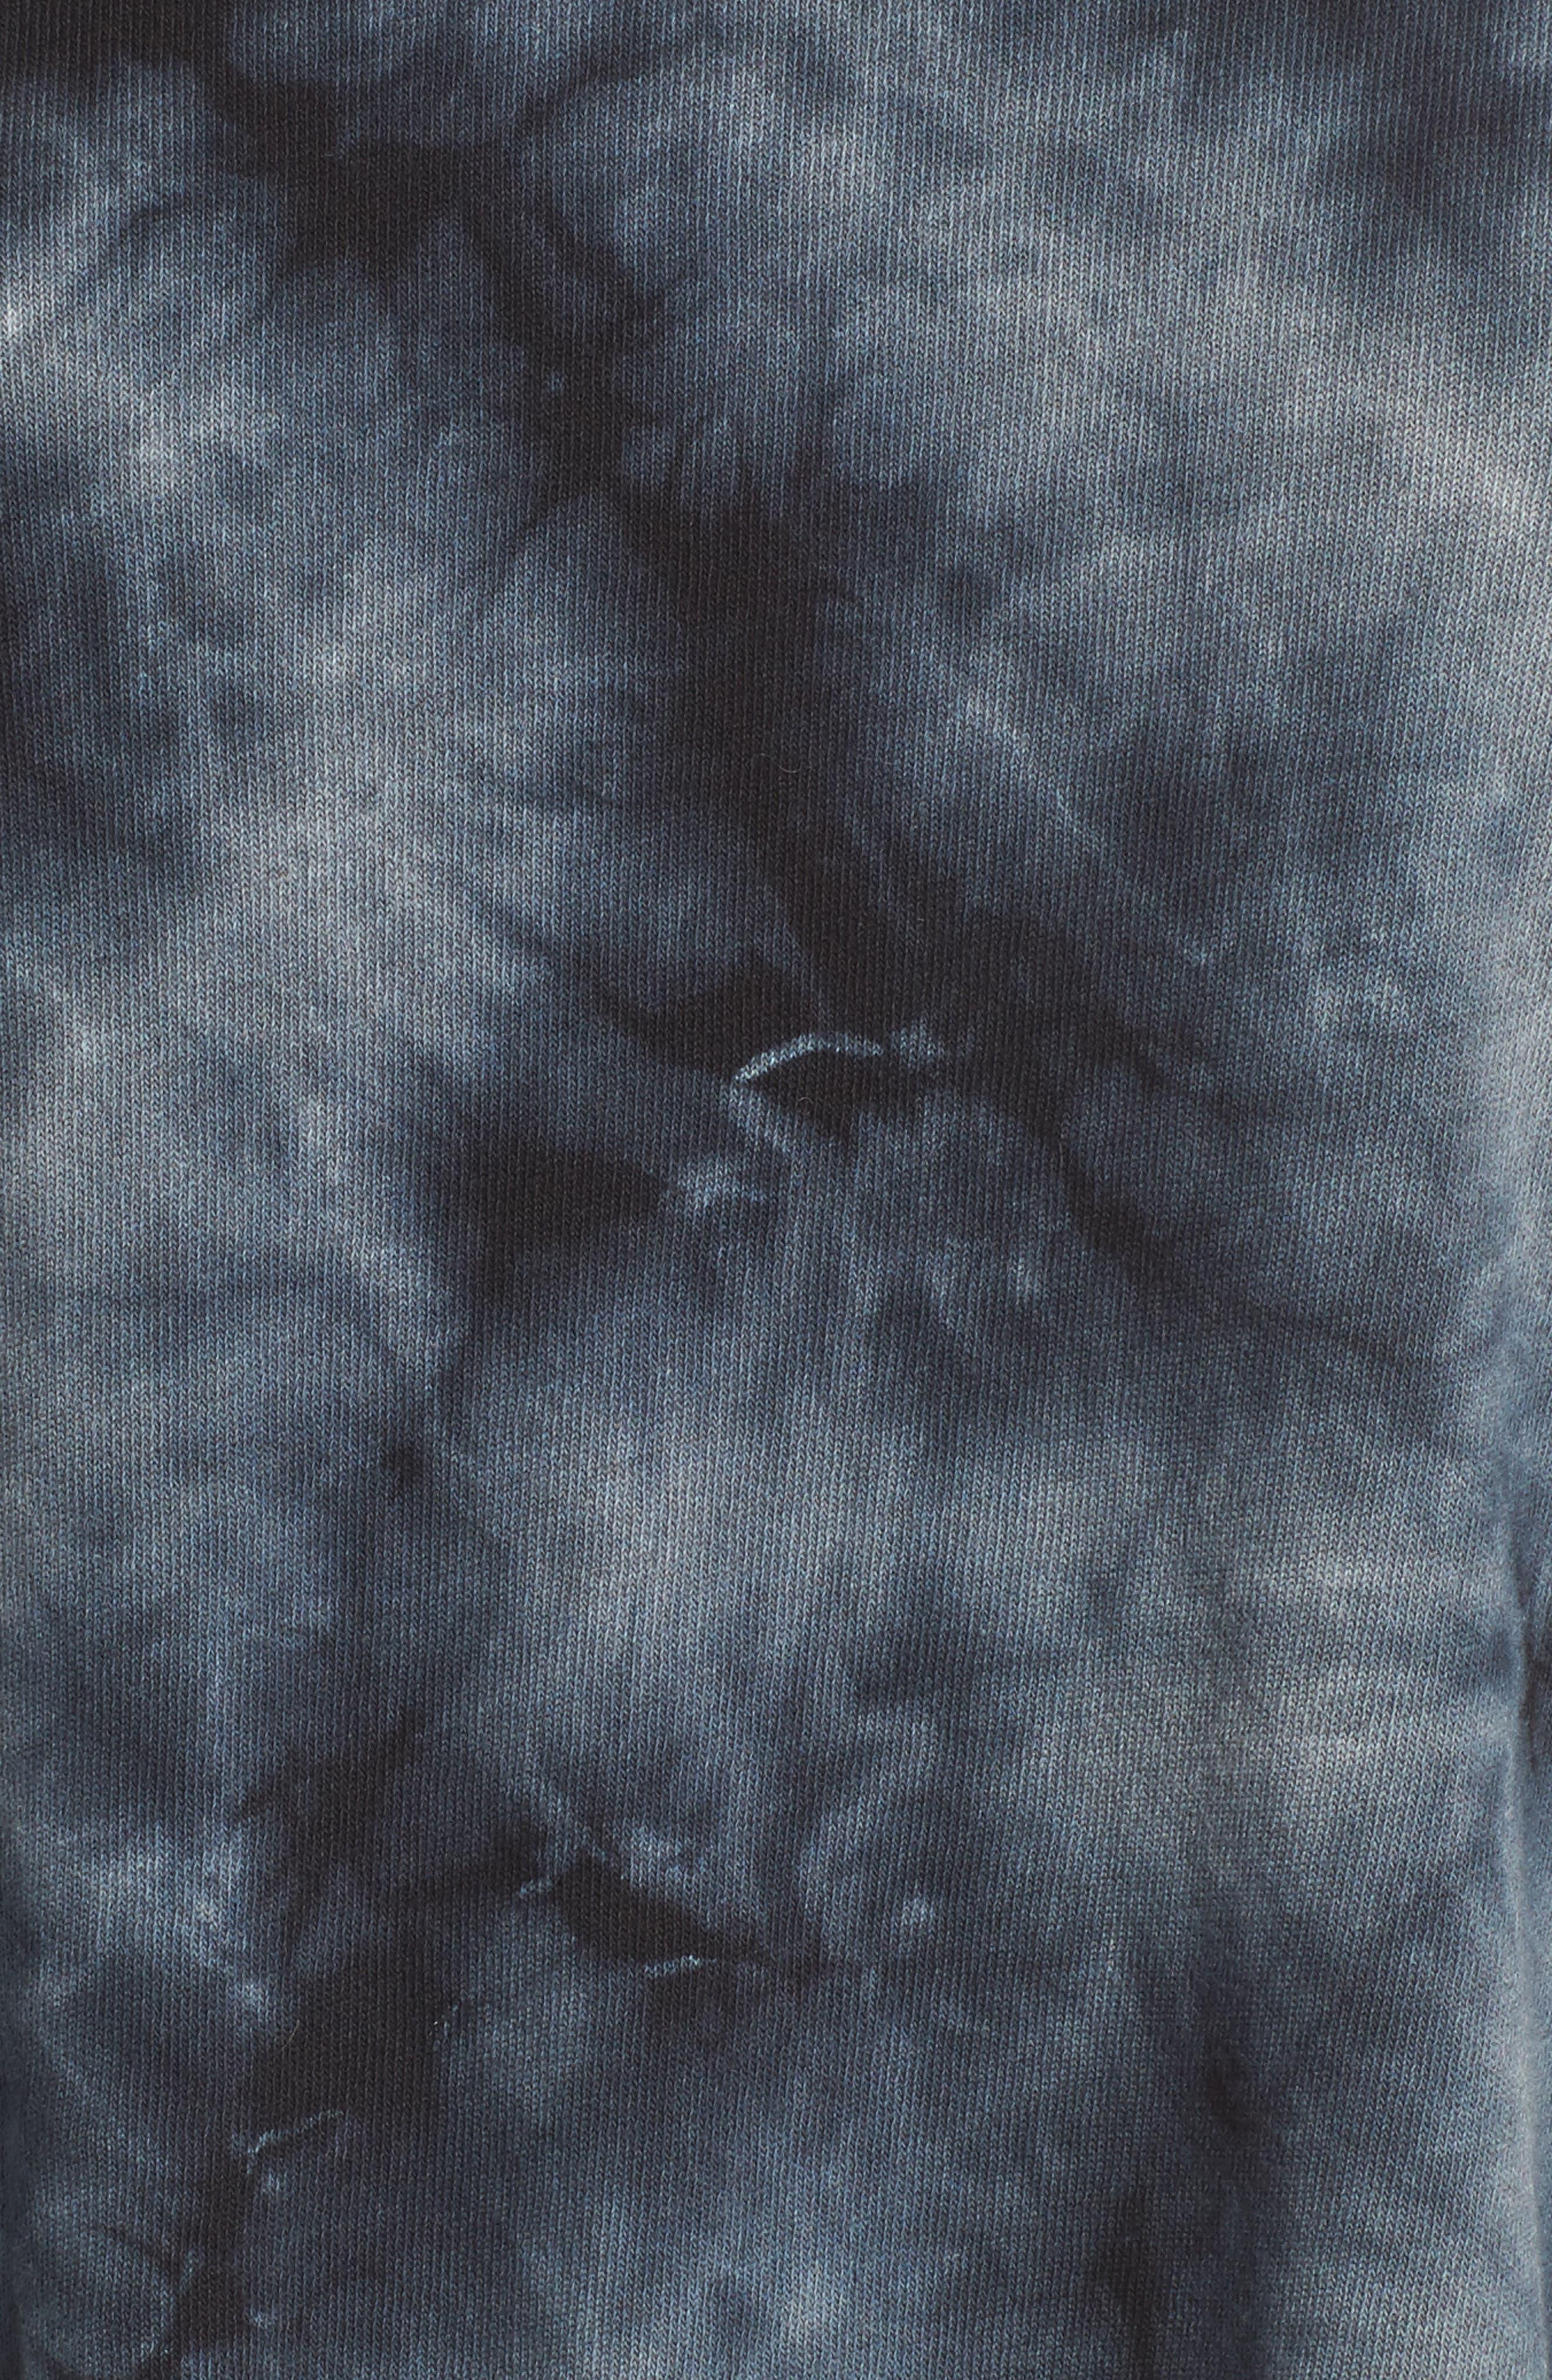 Tie Dye Sweatshirt,                             Alternate thumbnail 5, color,                             010